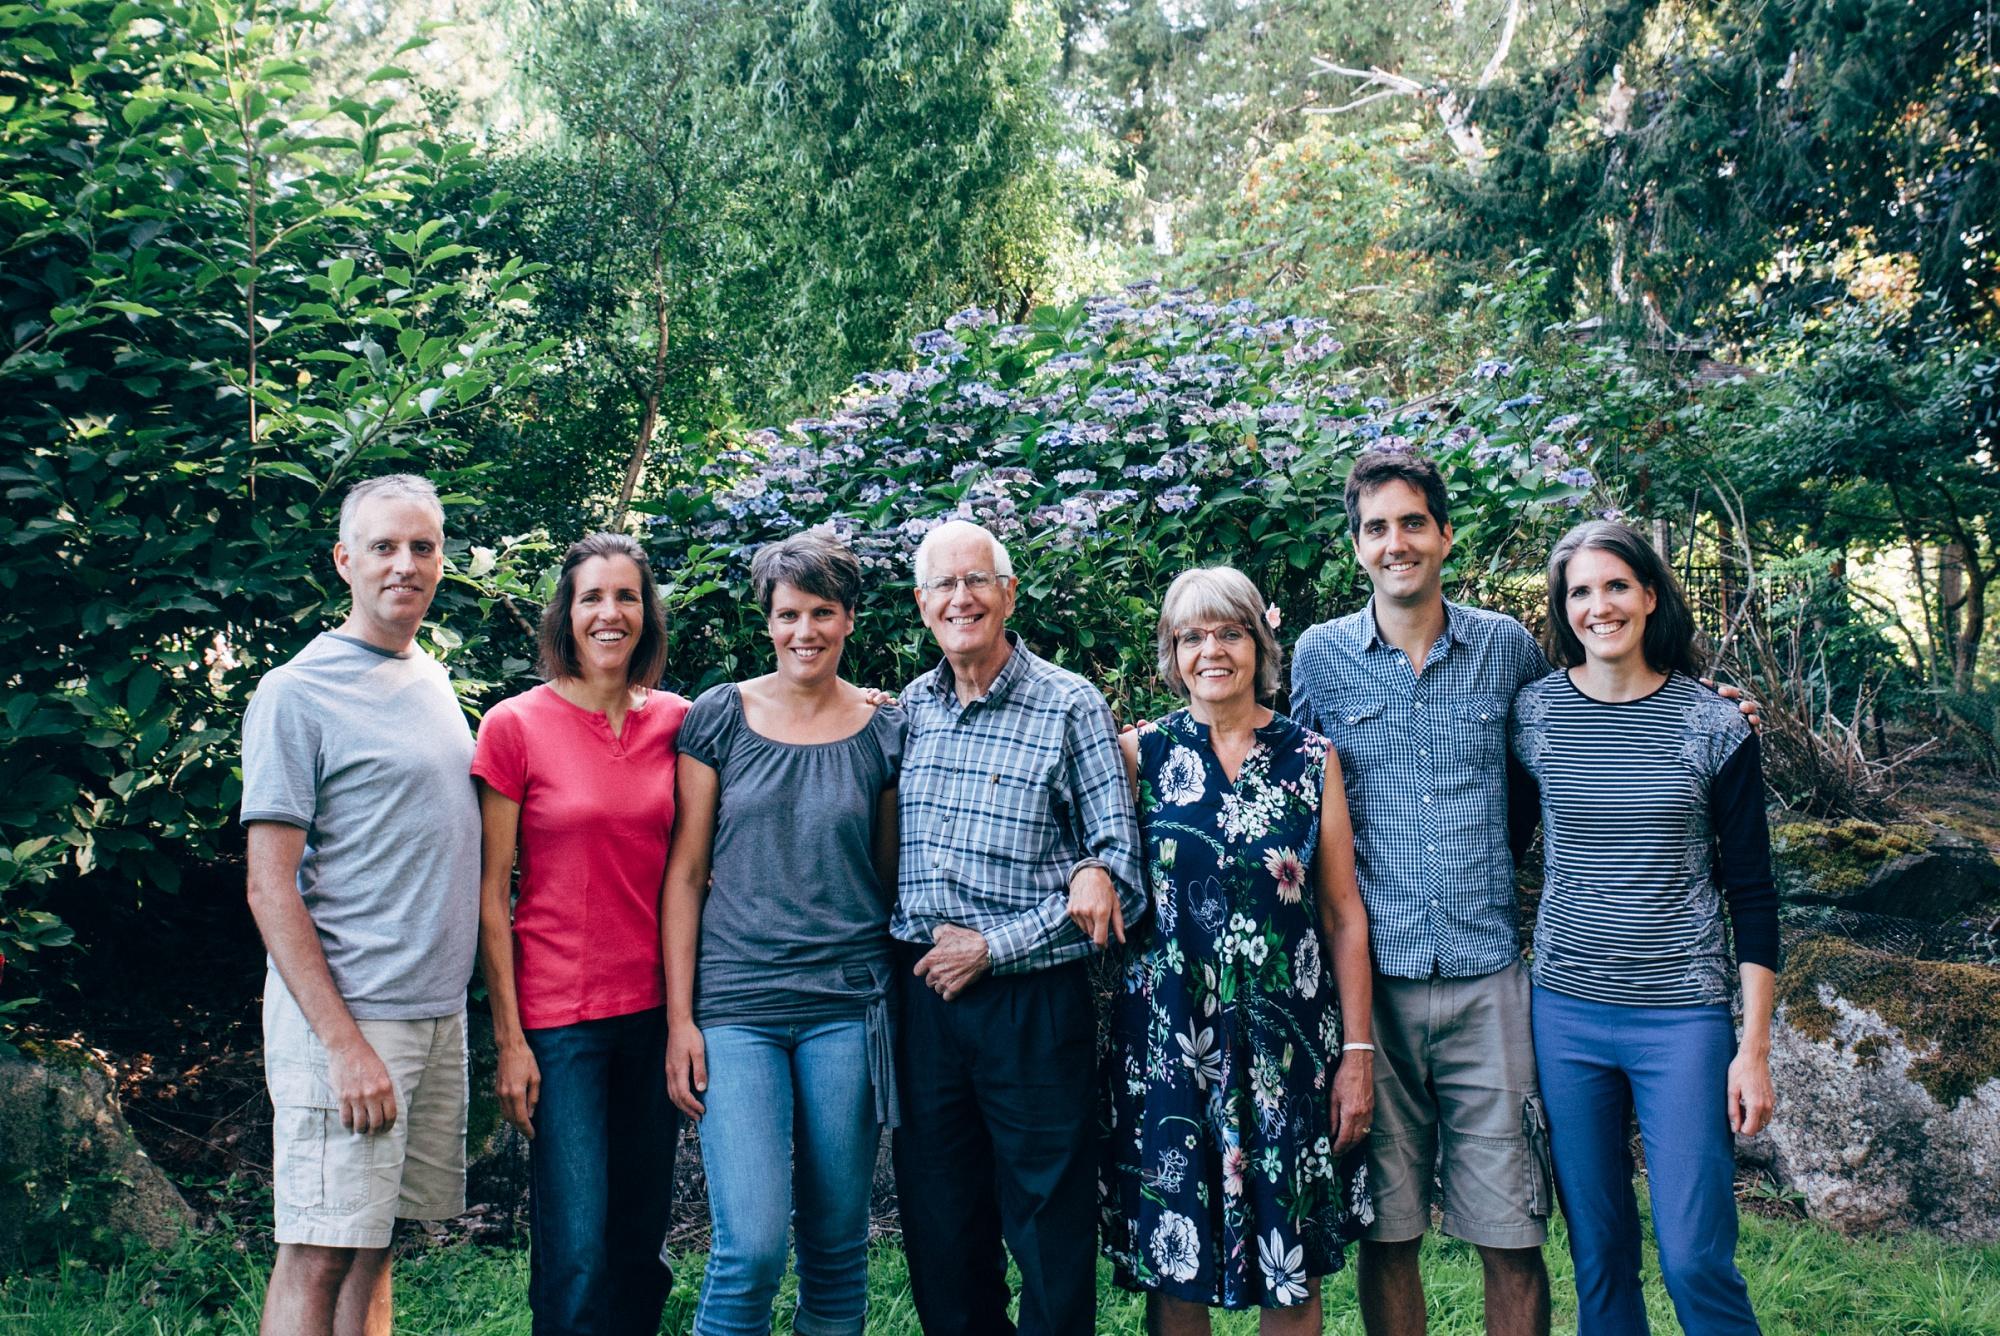 family photos victoria bc family photographer (2).jpg